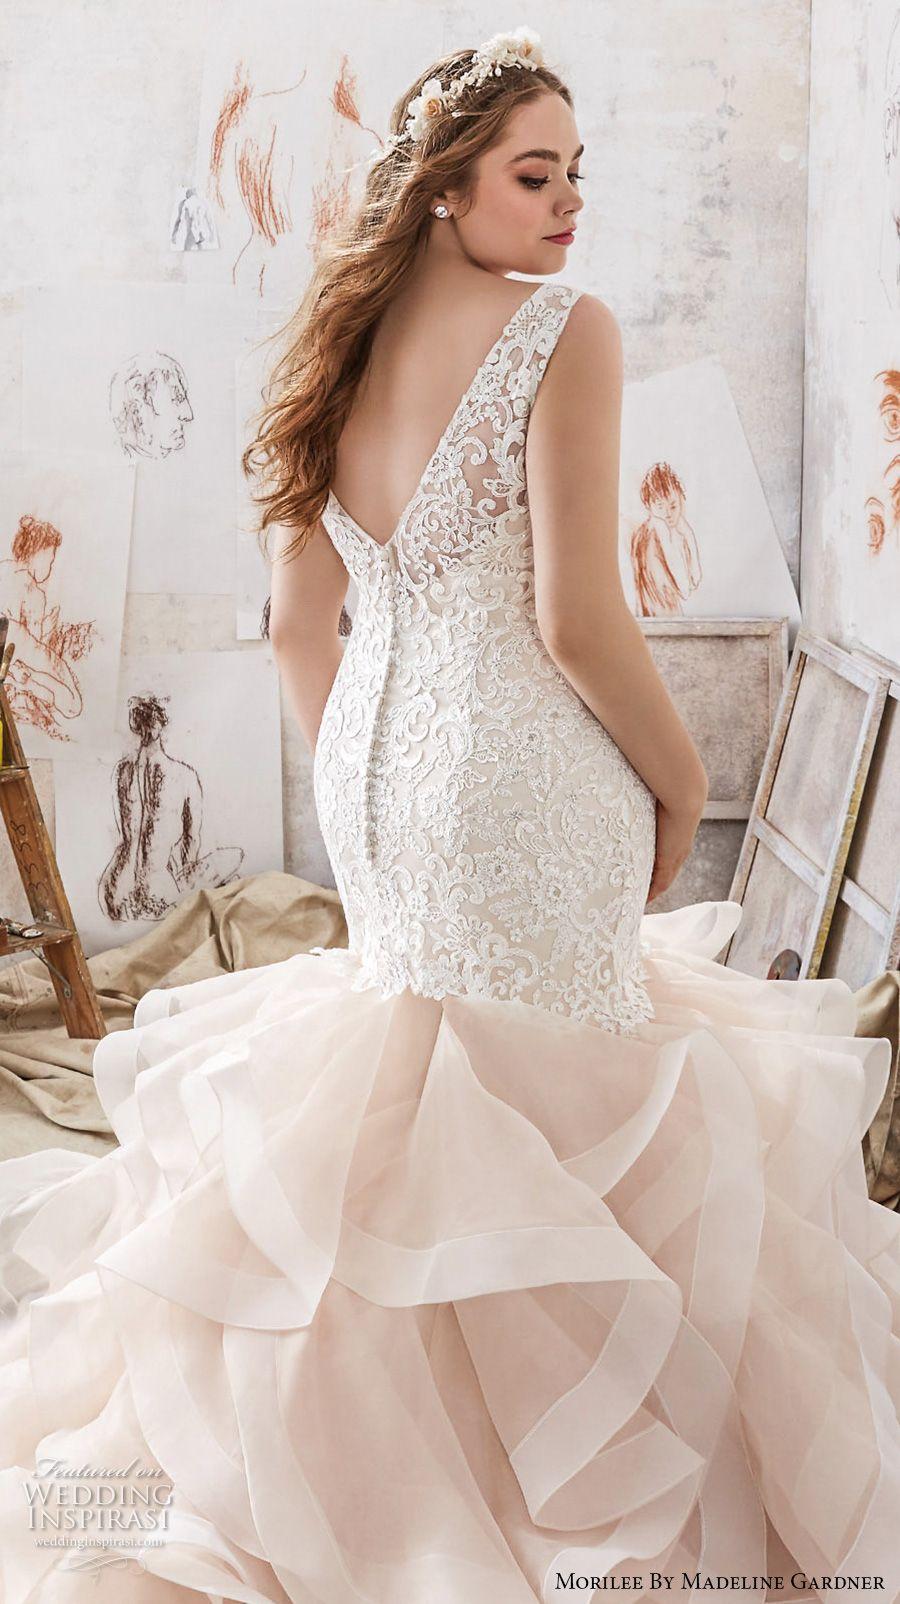 Best Morilee by Madeline Gardner Spring Wedding Dresses u ucJulietta ud Plus Size Bridal Collection